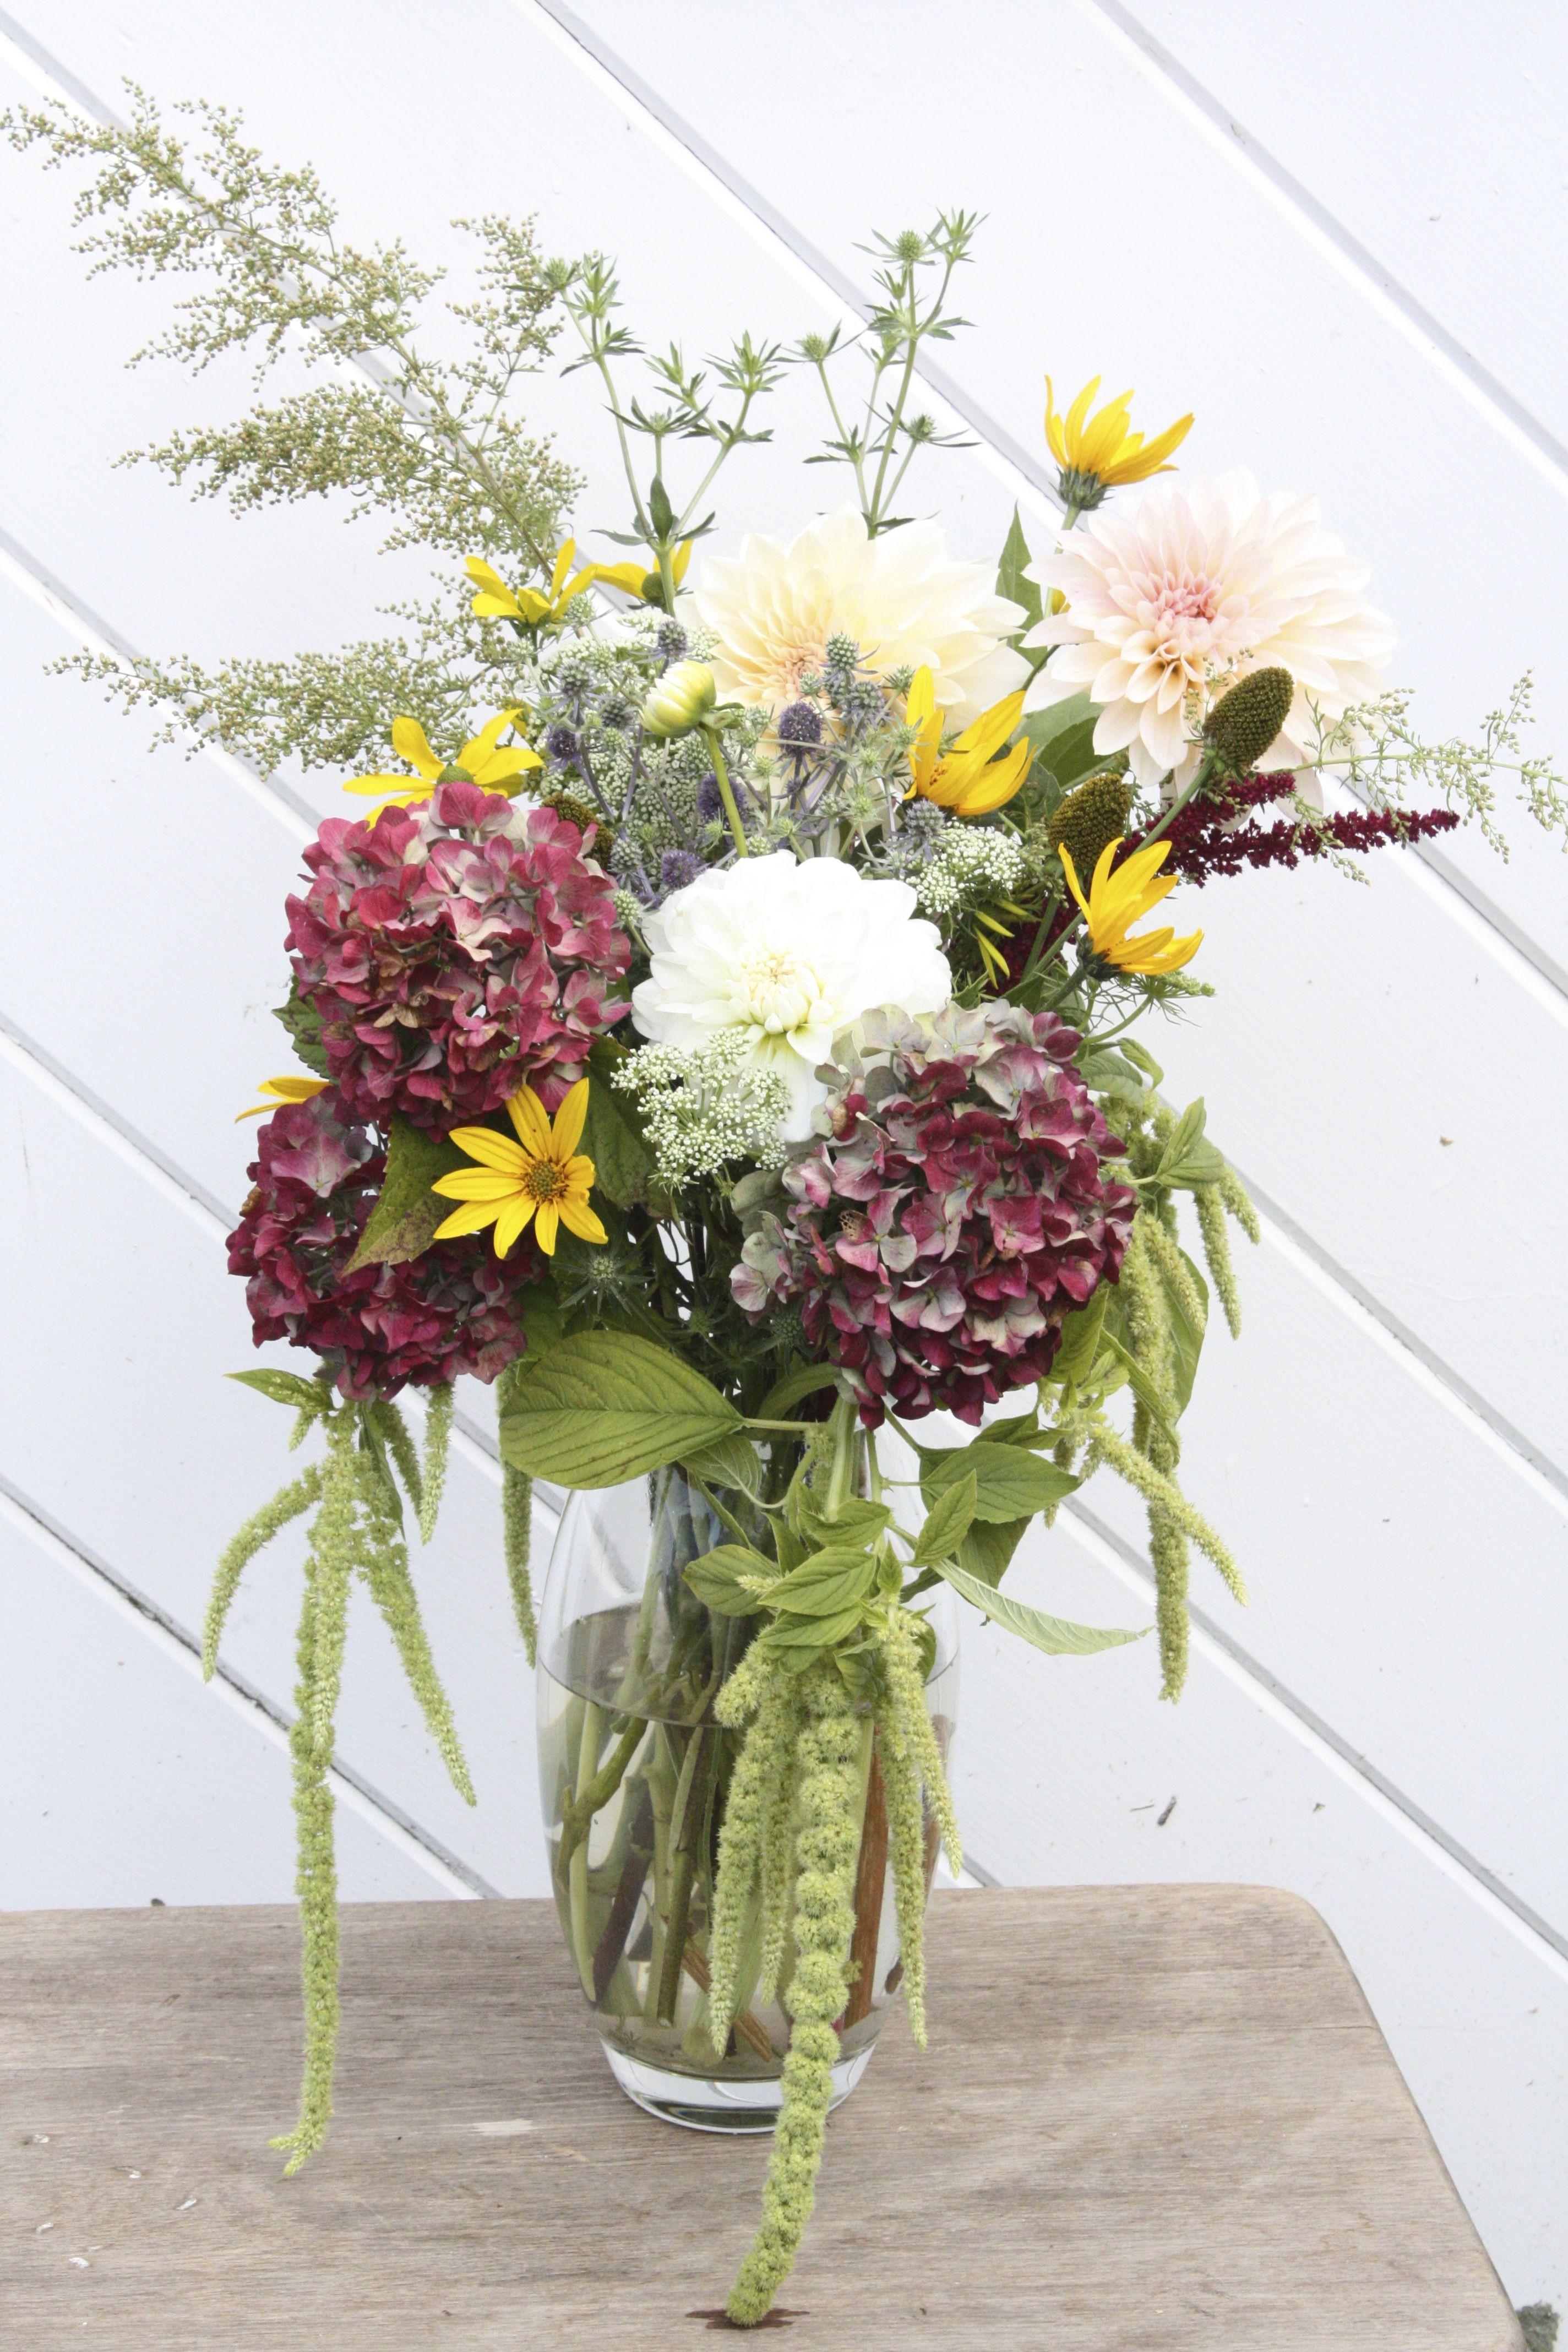 Amaranthus Flower Best Of October Seasonal Flowers Dahlia Hydrangea Sweet Annie Emerald